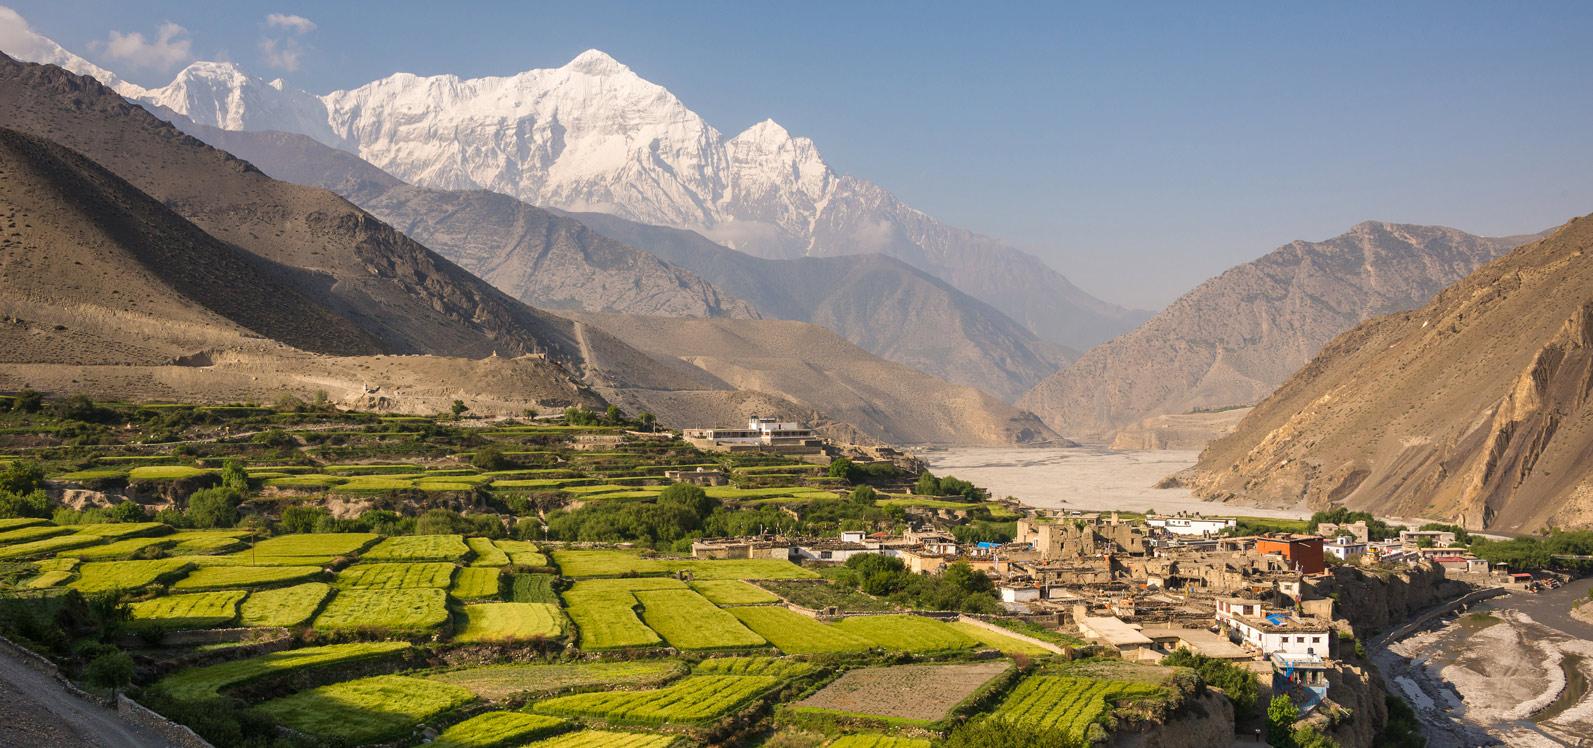 Uroki Nepalu